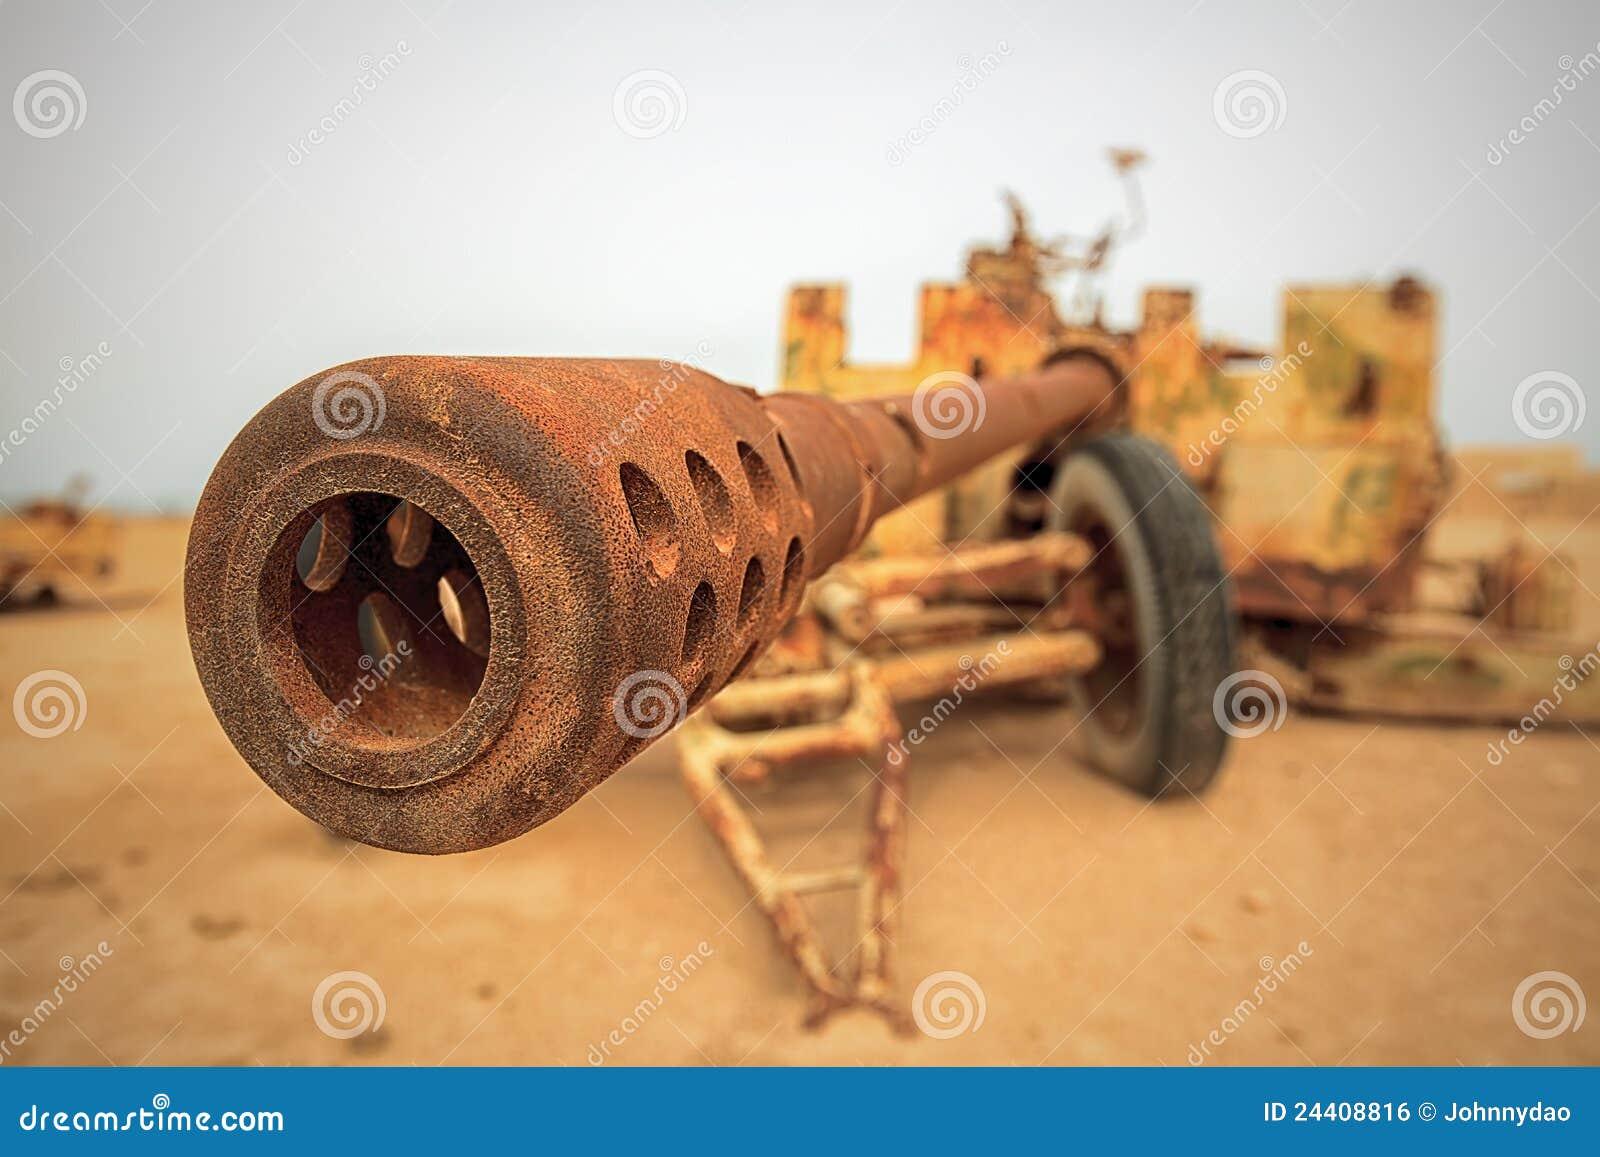 http://thumbs.dreamstime.com/z/old-military-anti-tank-gun-24408816.jpg